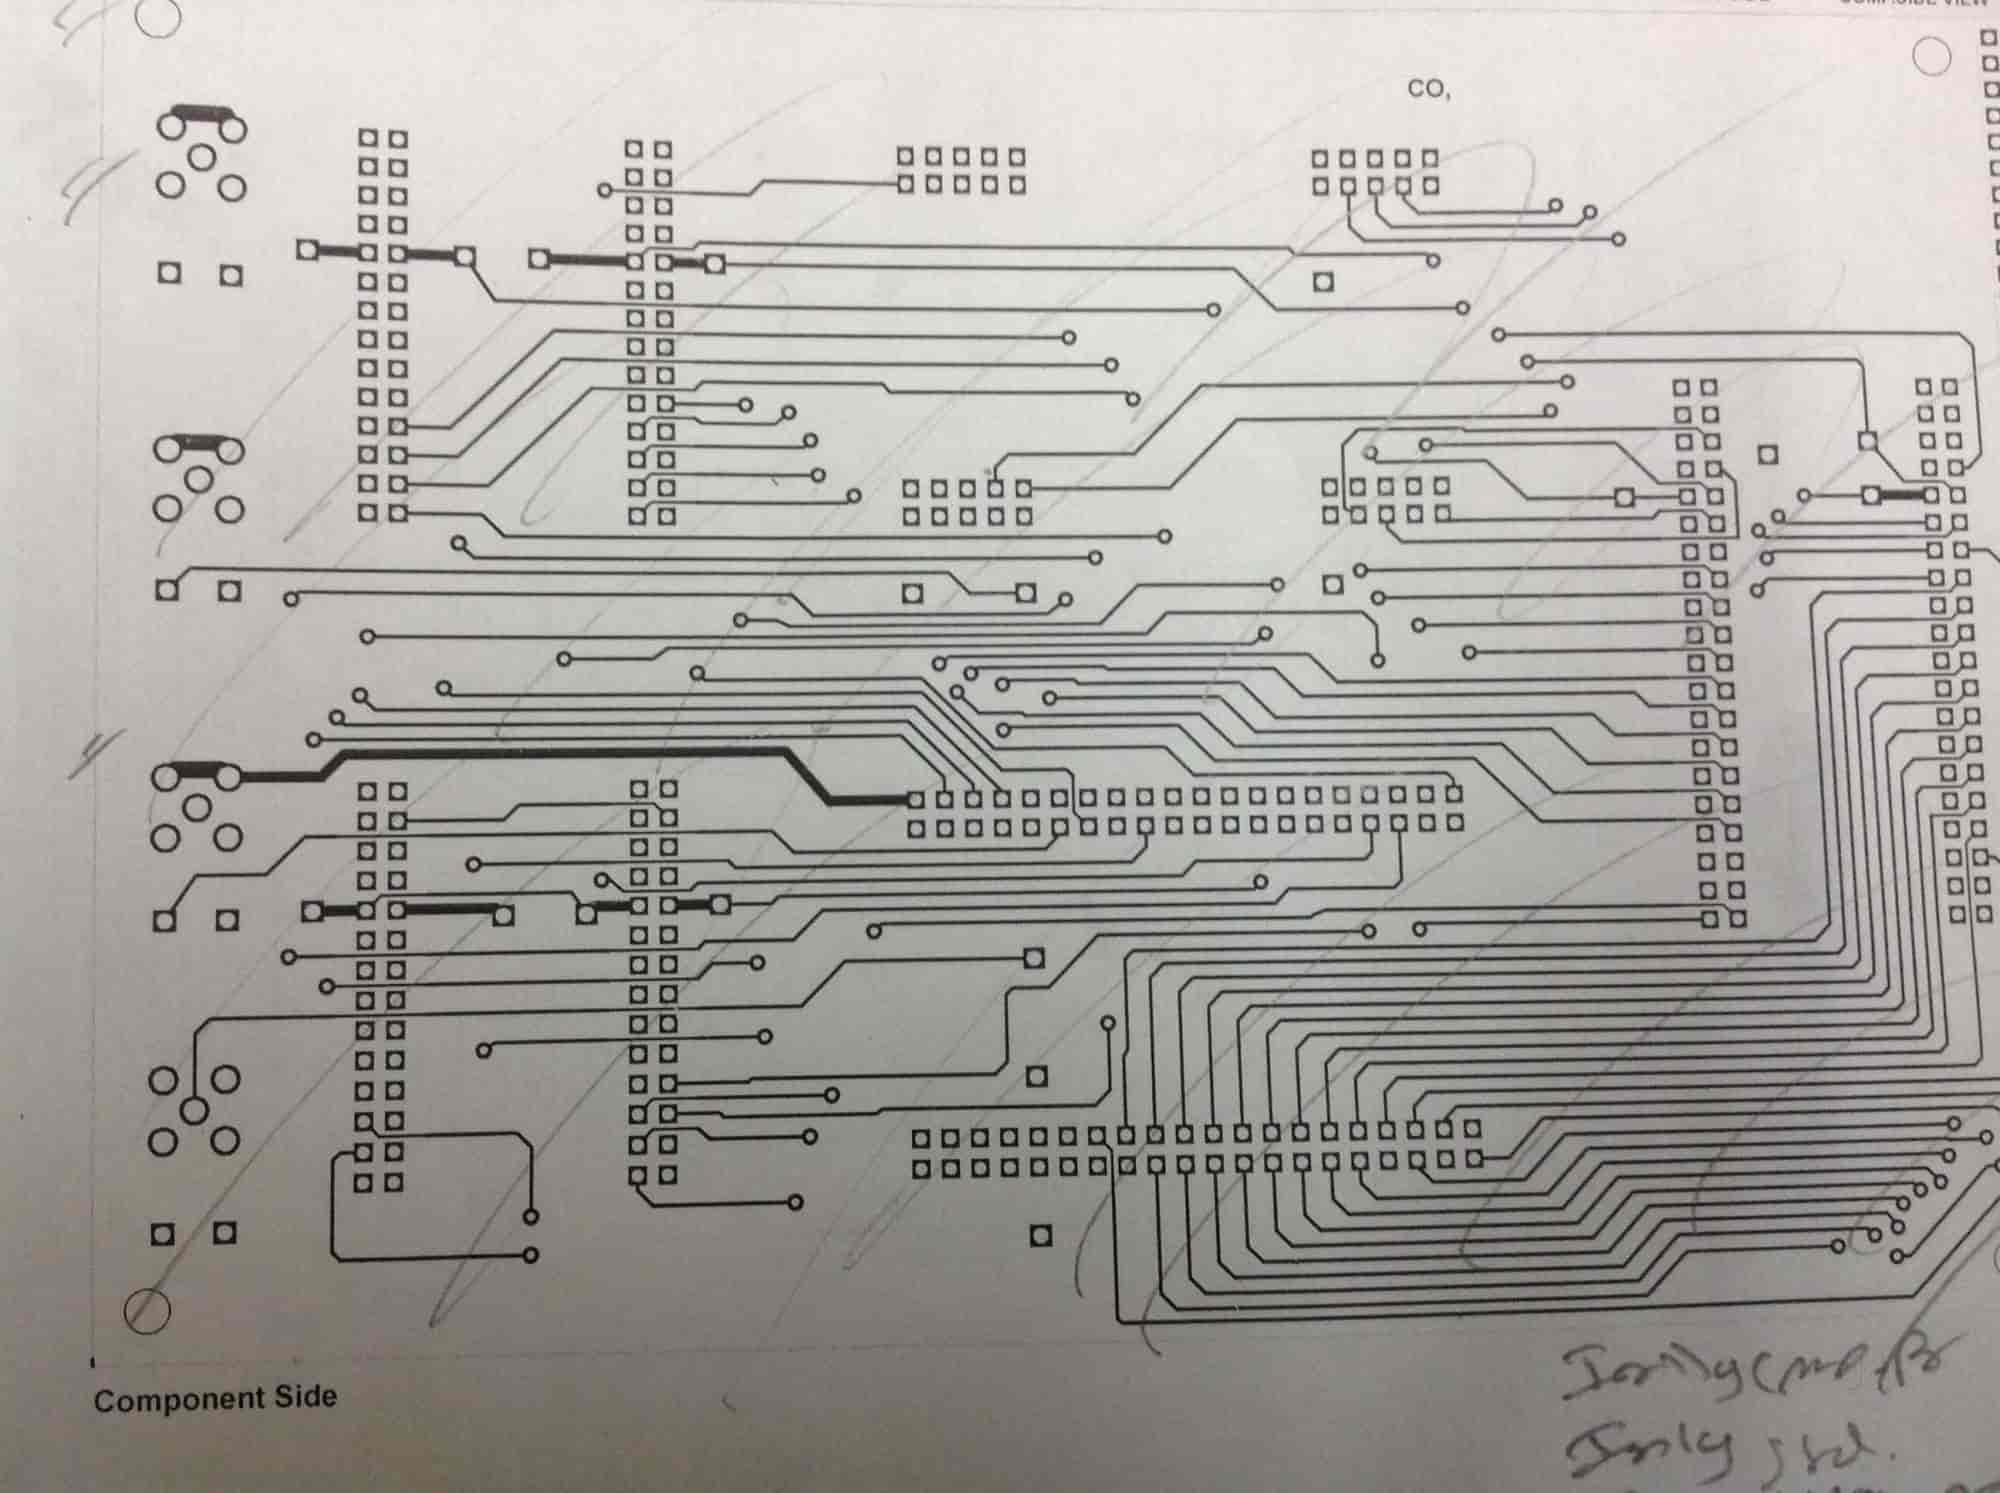 Design Solutions Photos Dadar East Mumbai Pictures Images Printed Circuit Schematics Board Front Panel Artwork